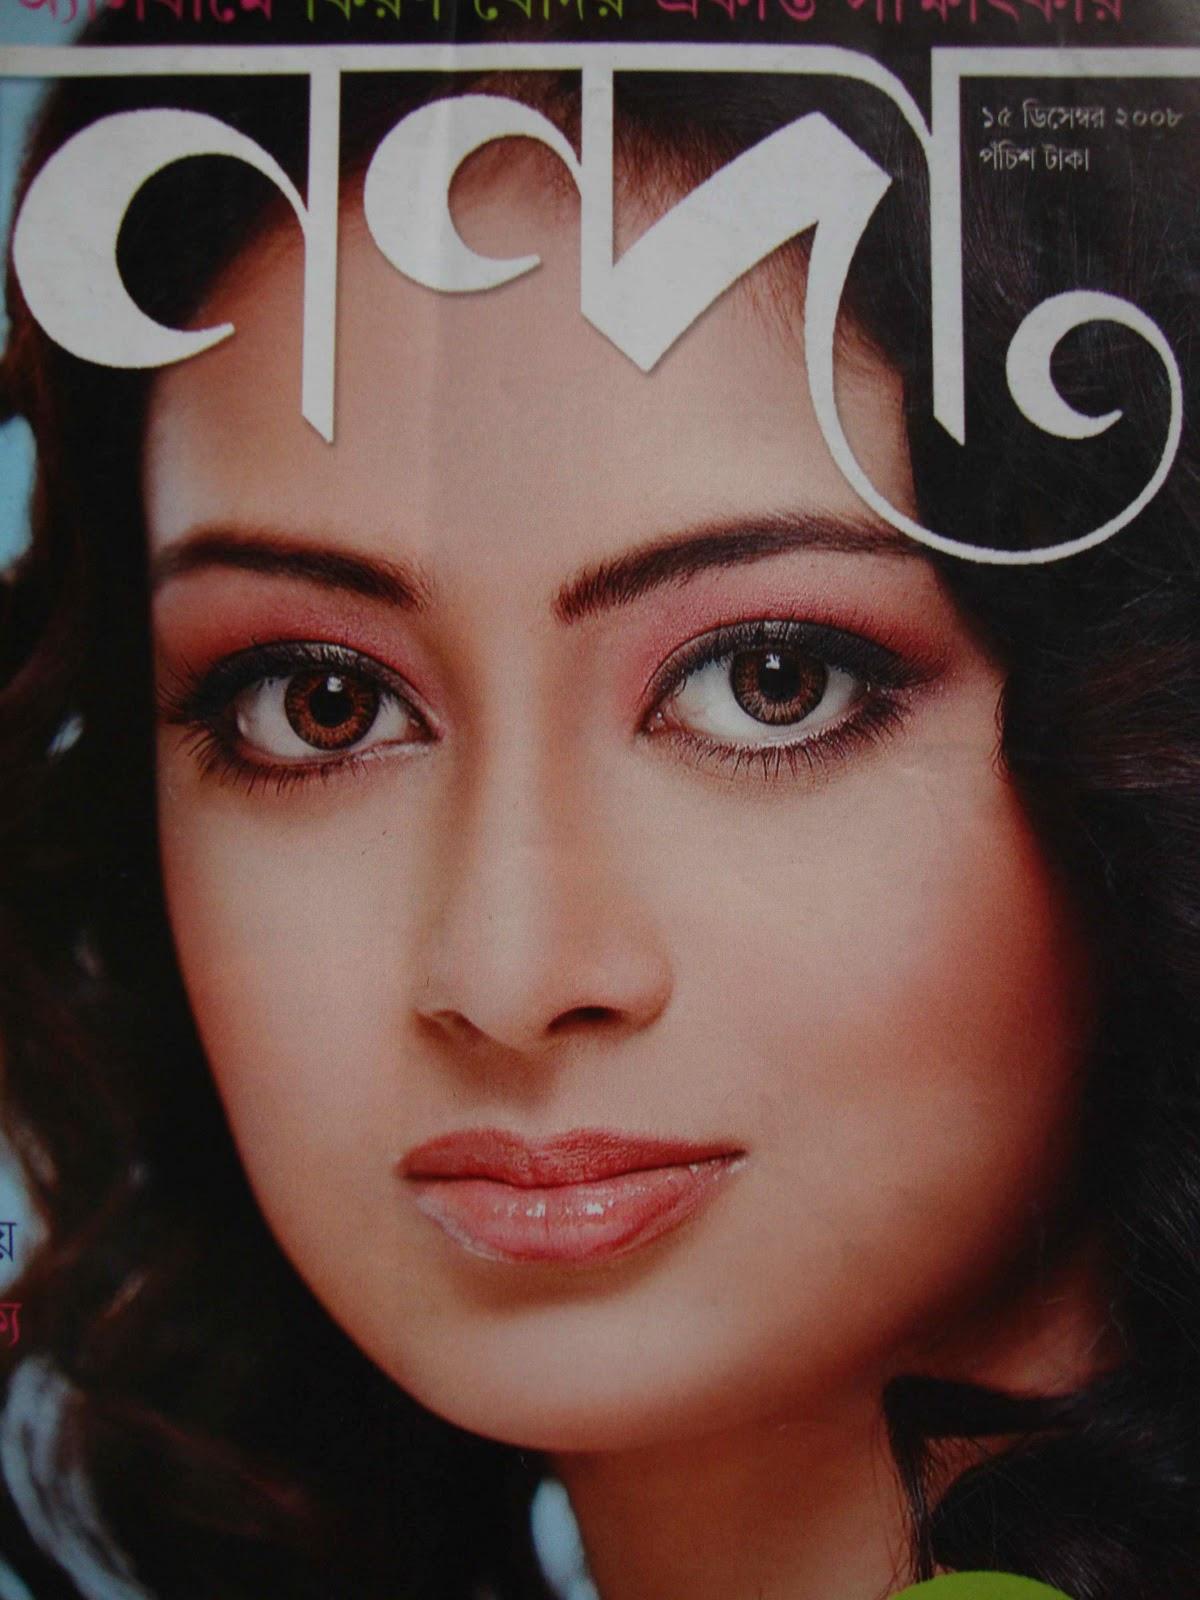 bengali celebrity ,hot models and seductive girl: indian